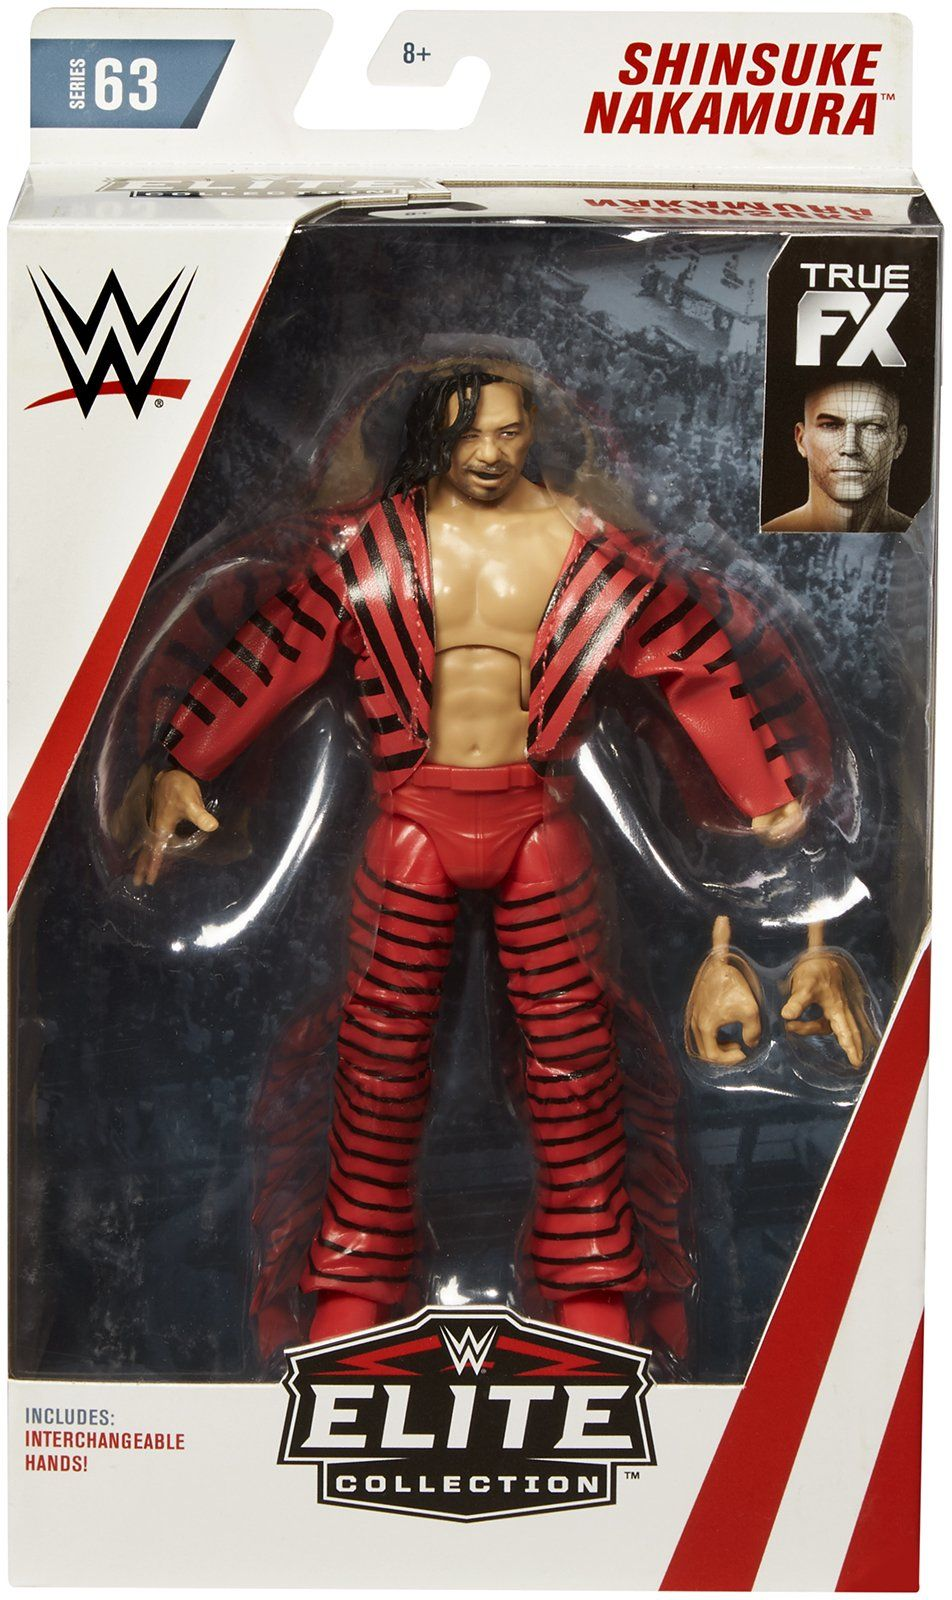 WWE Wrestling Zombies Shinsuke Nakamura Action Figure